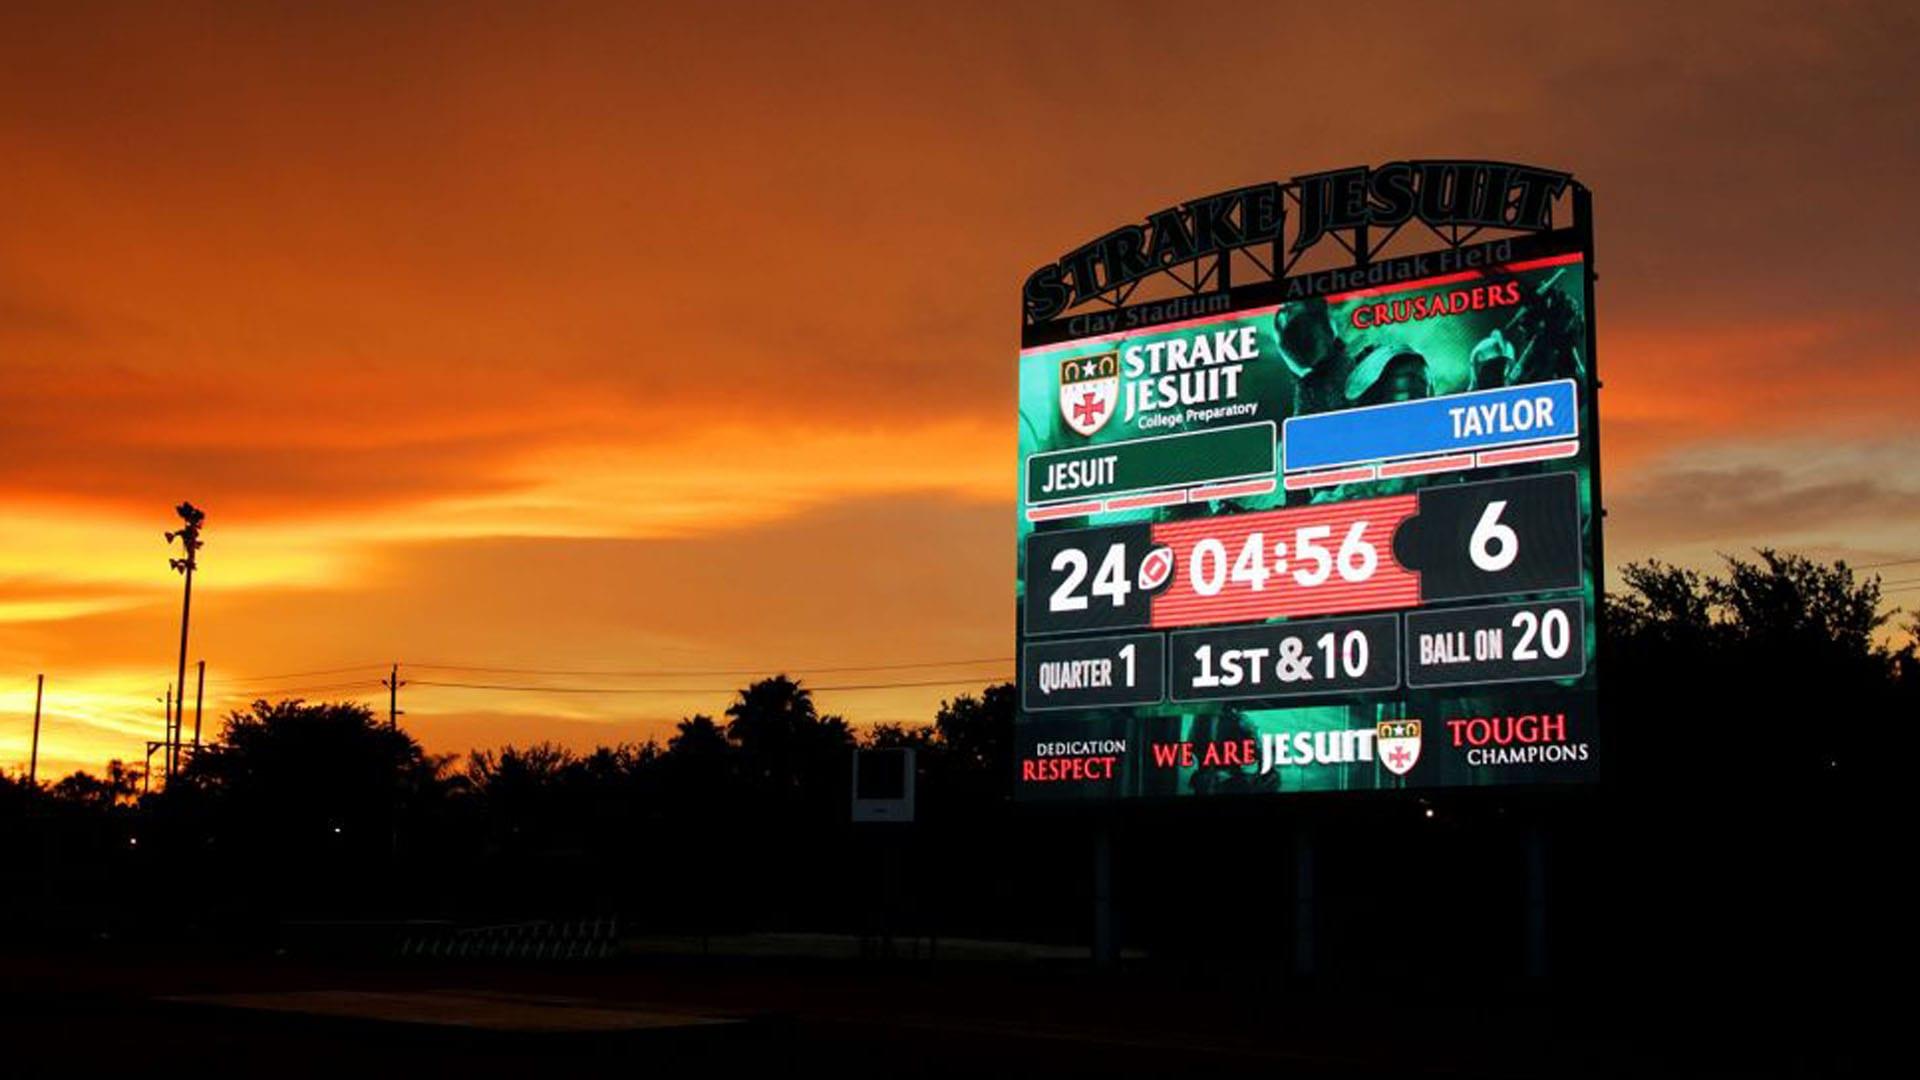 Neoti video panels football scoreboard